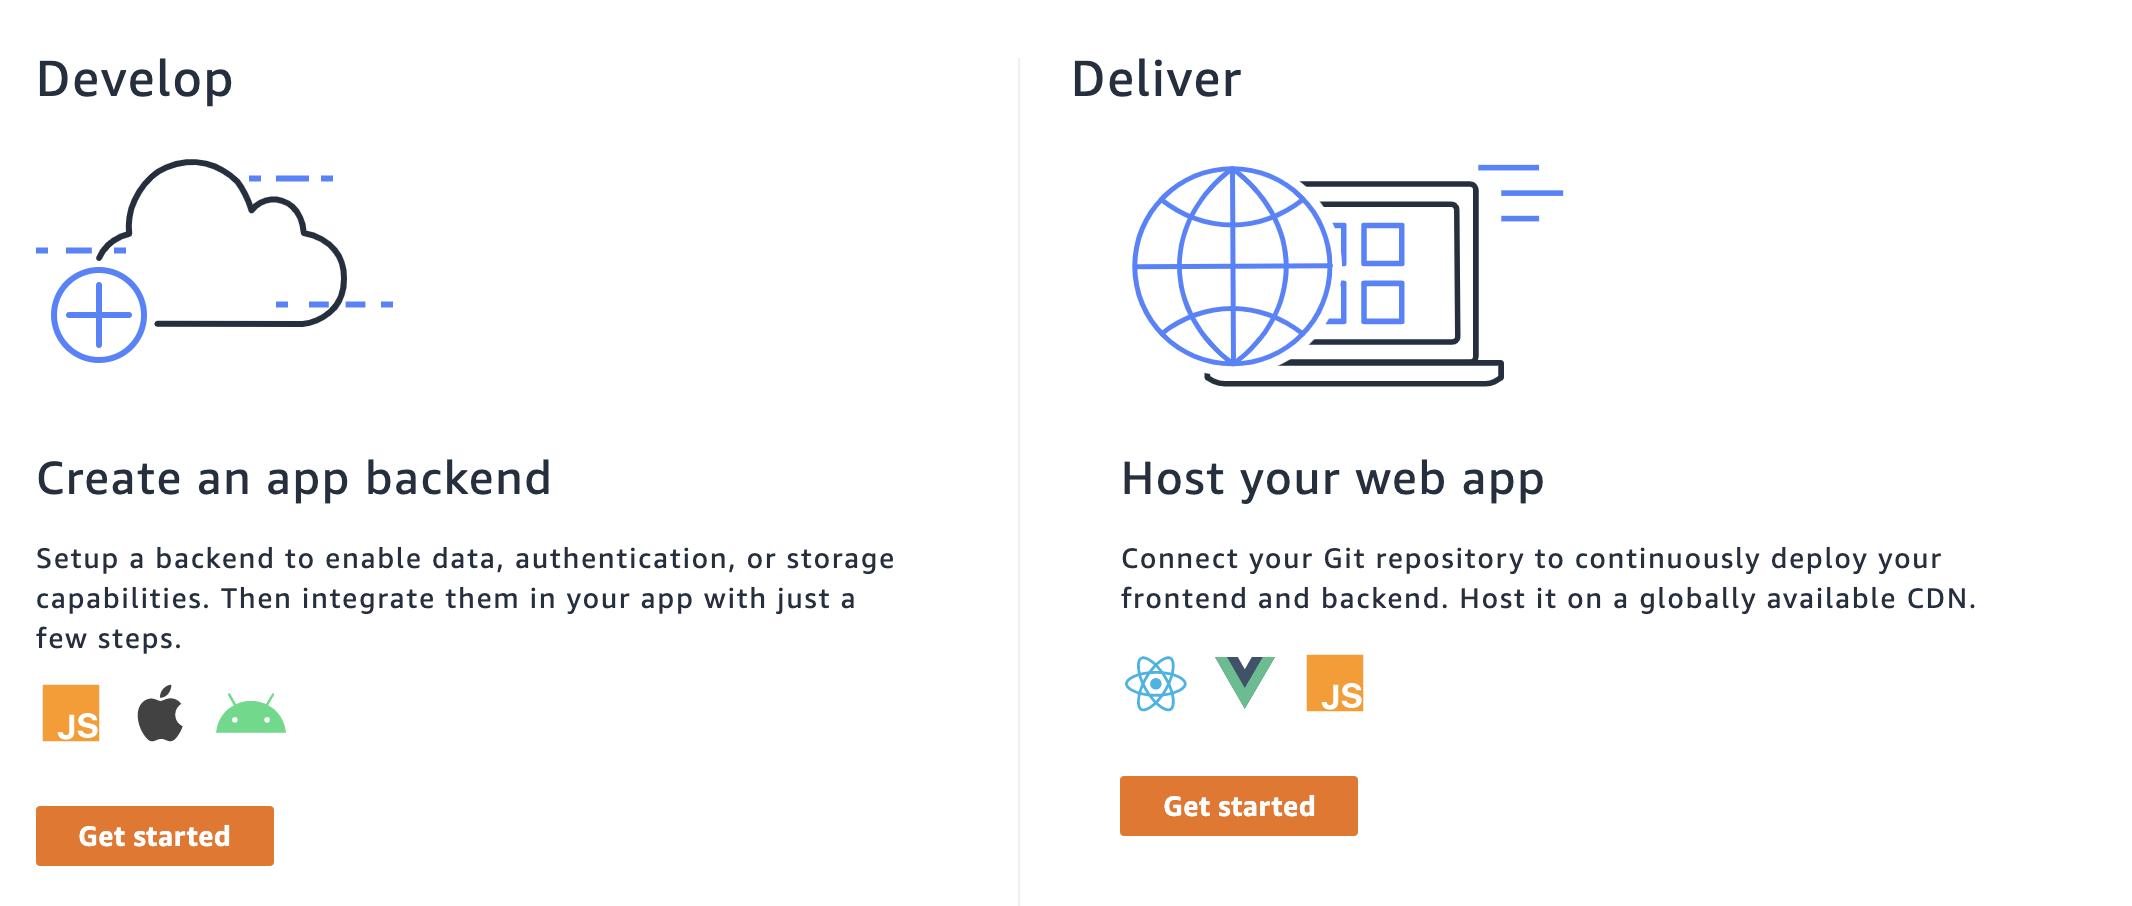 AWS Amplify Sandbox create an app backend or host your web app options